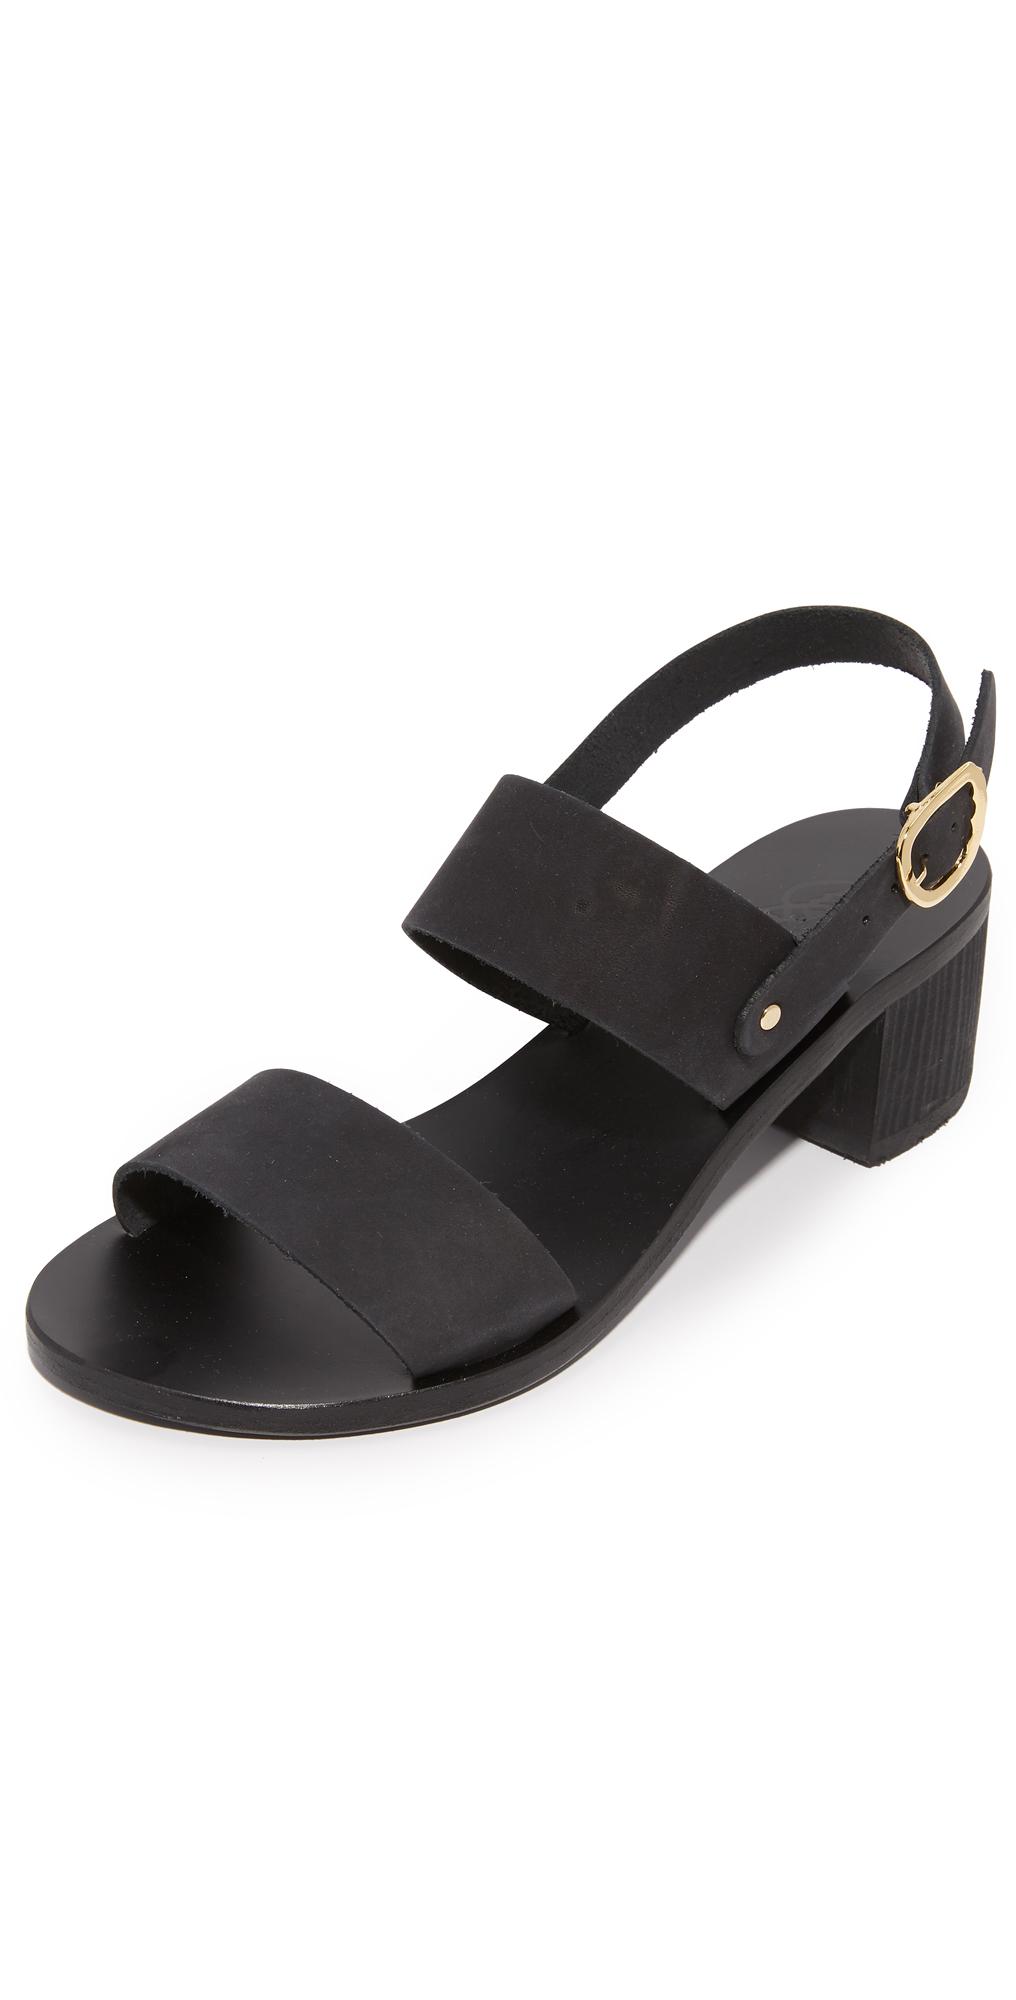 Lefki Block City Sandals Ancient Greek Sandals